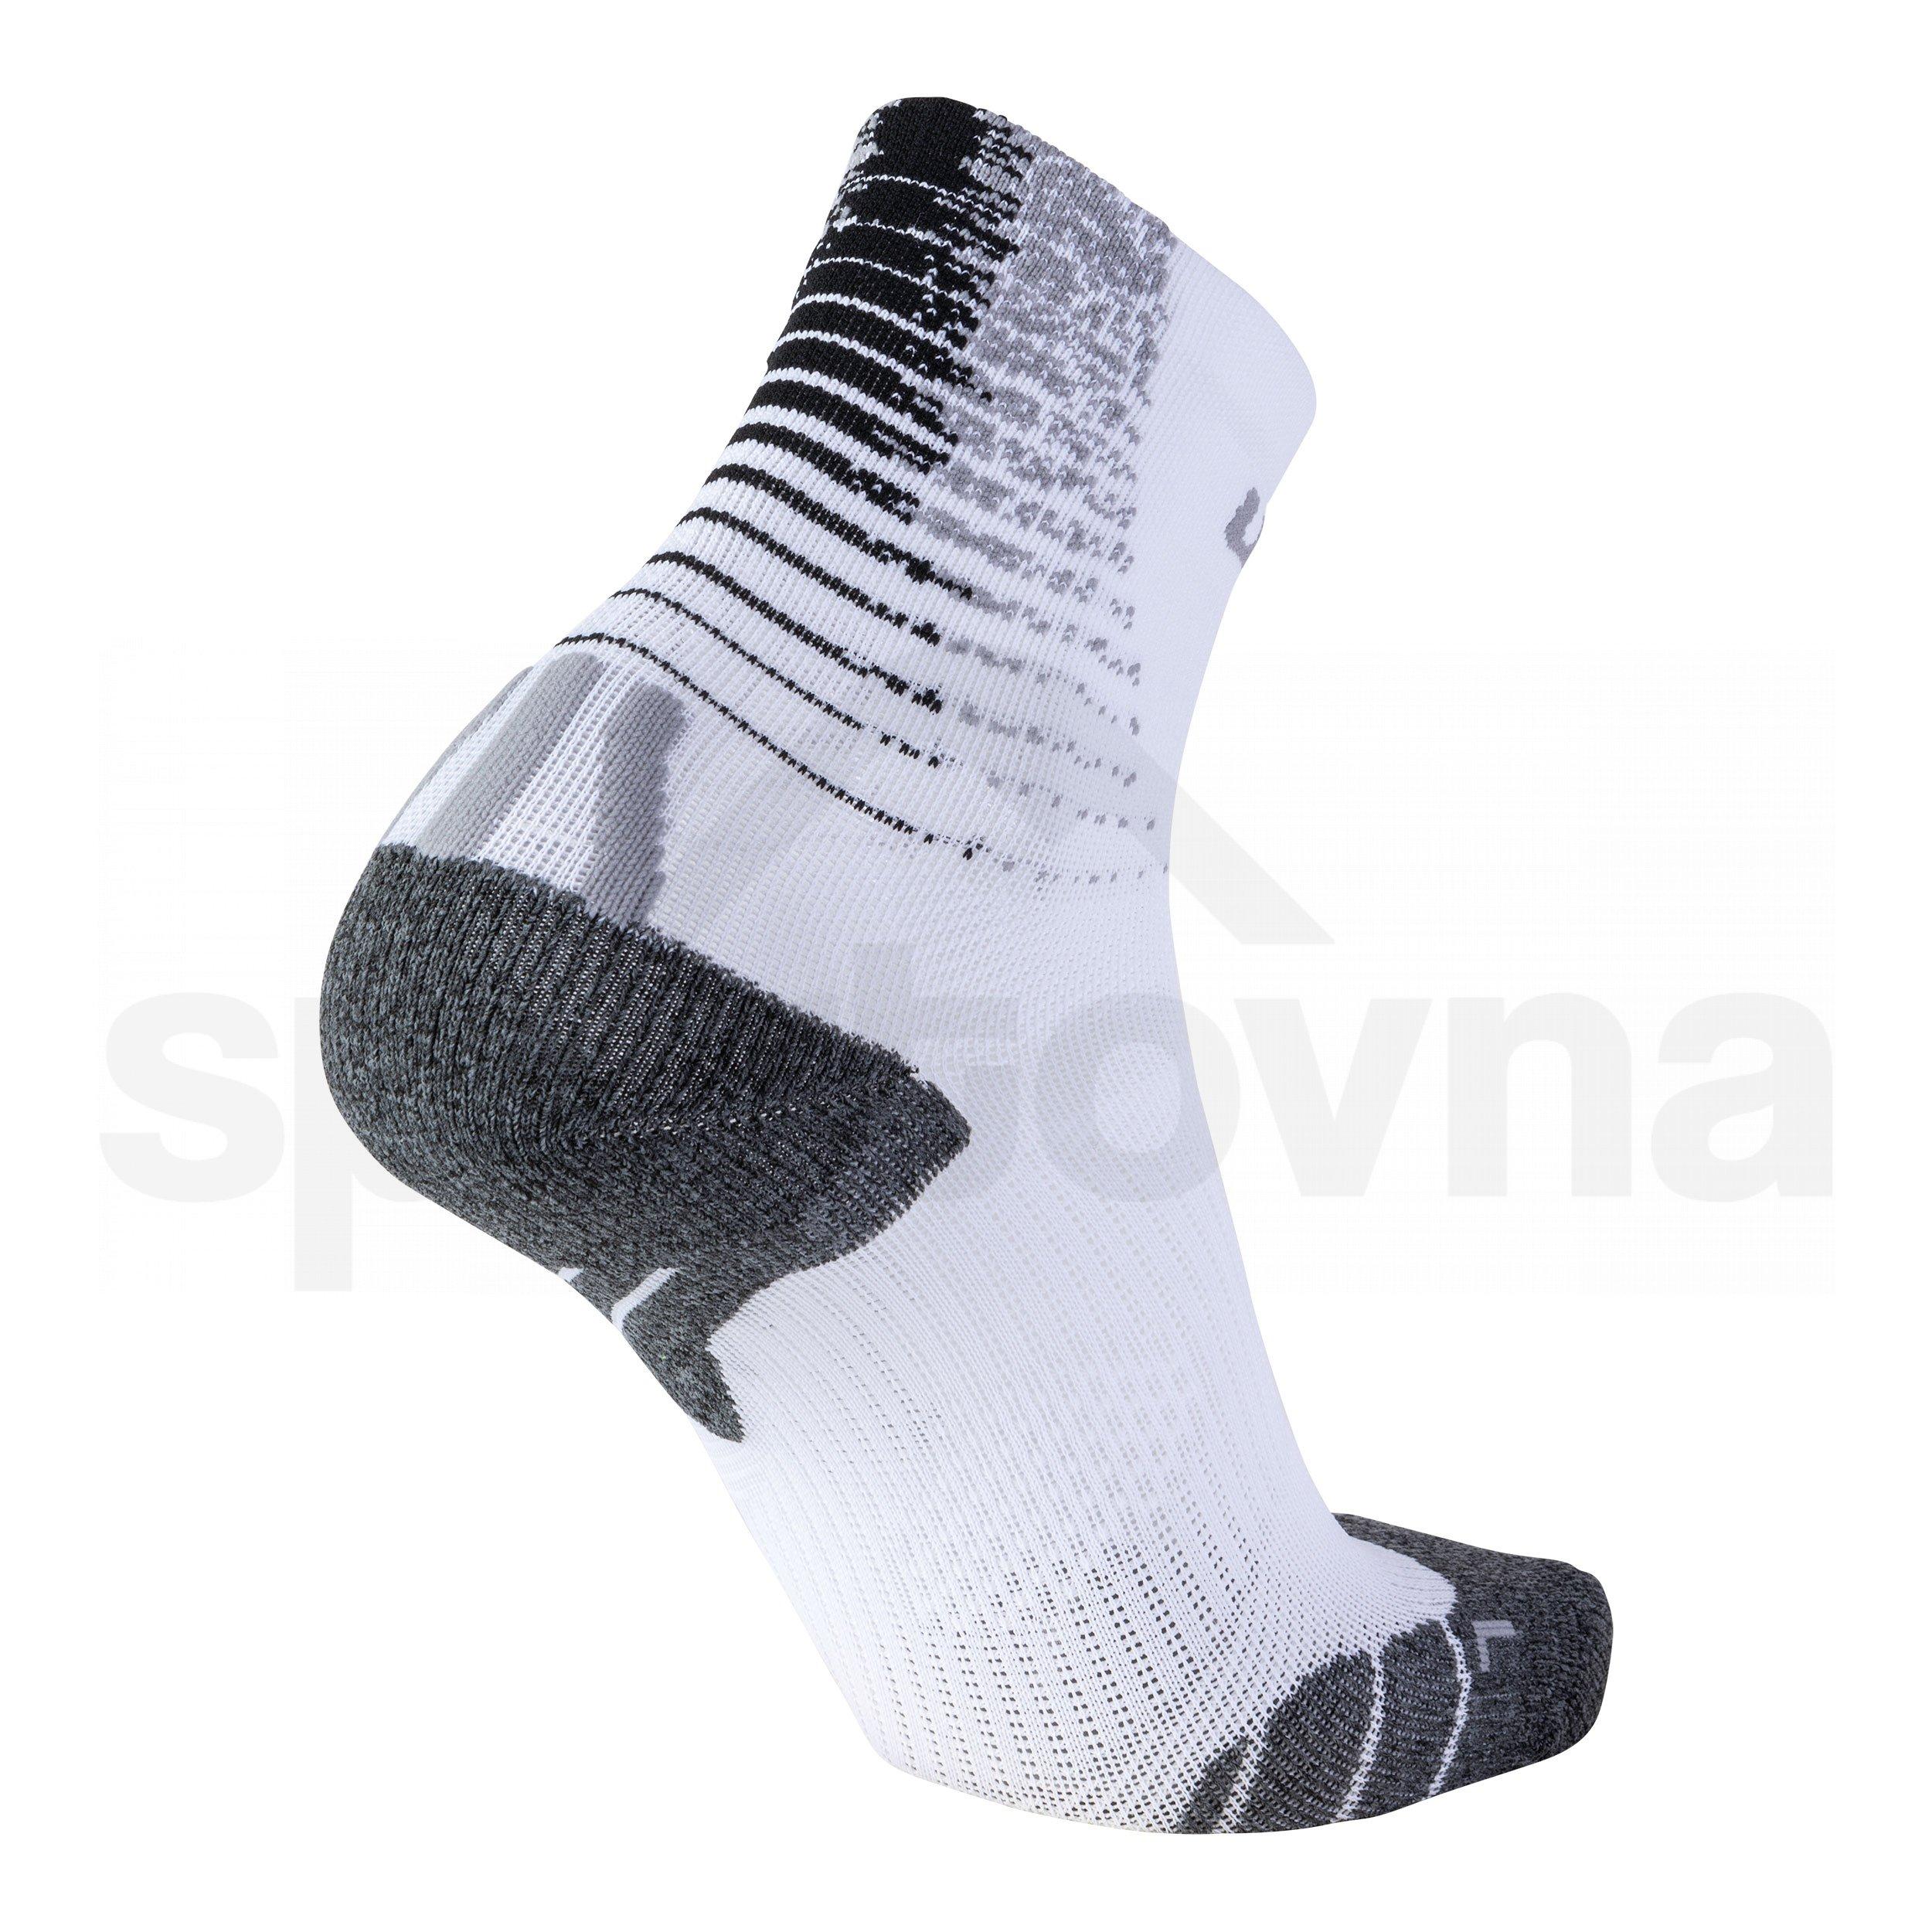 Pánské ponožky UYN RUN FIT SOCKS S100137W106 - bílá/černá